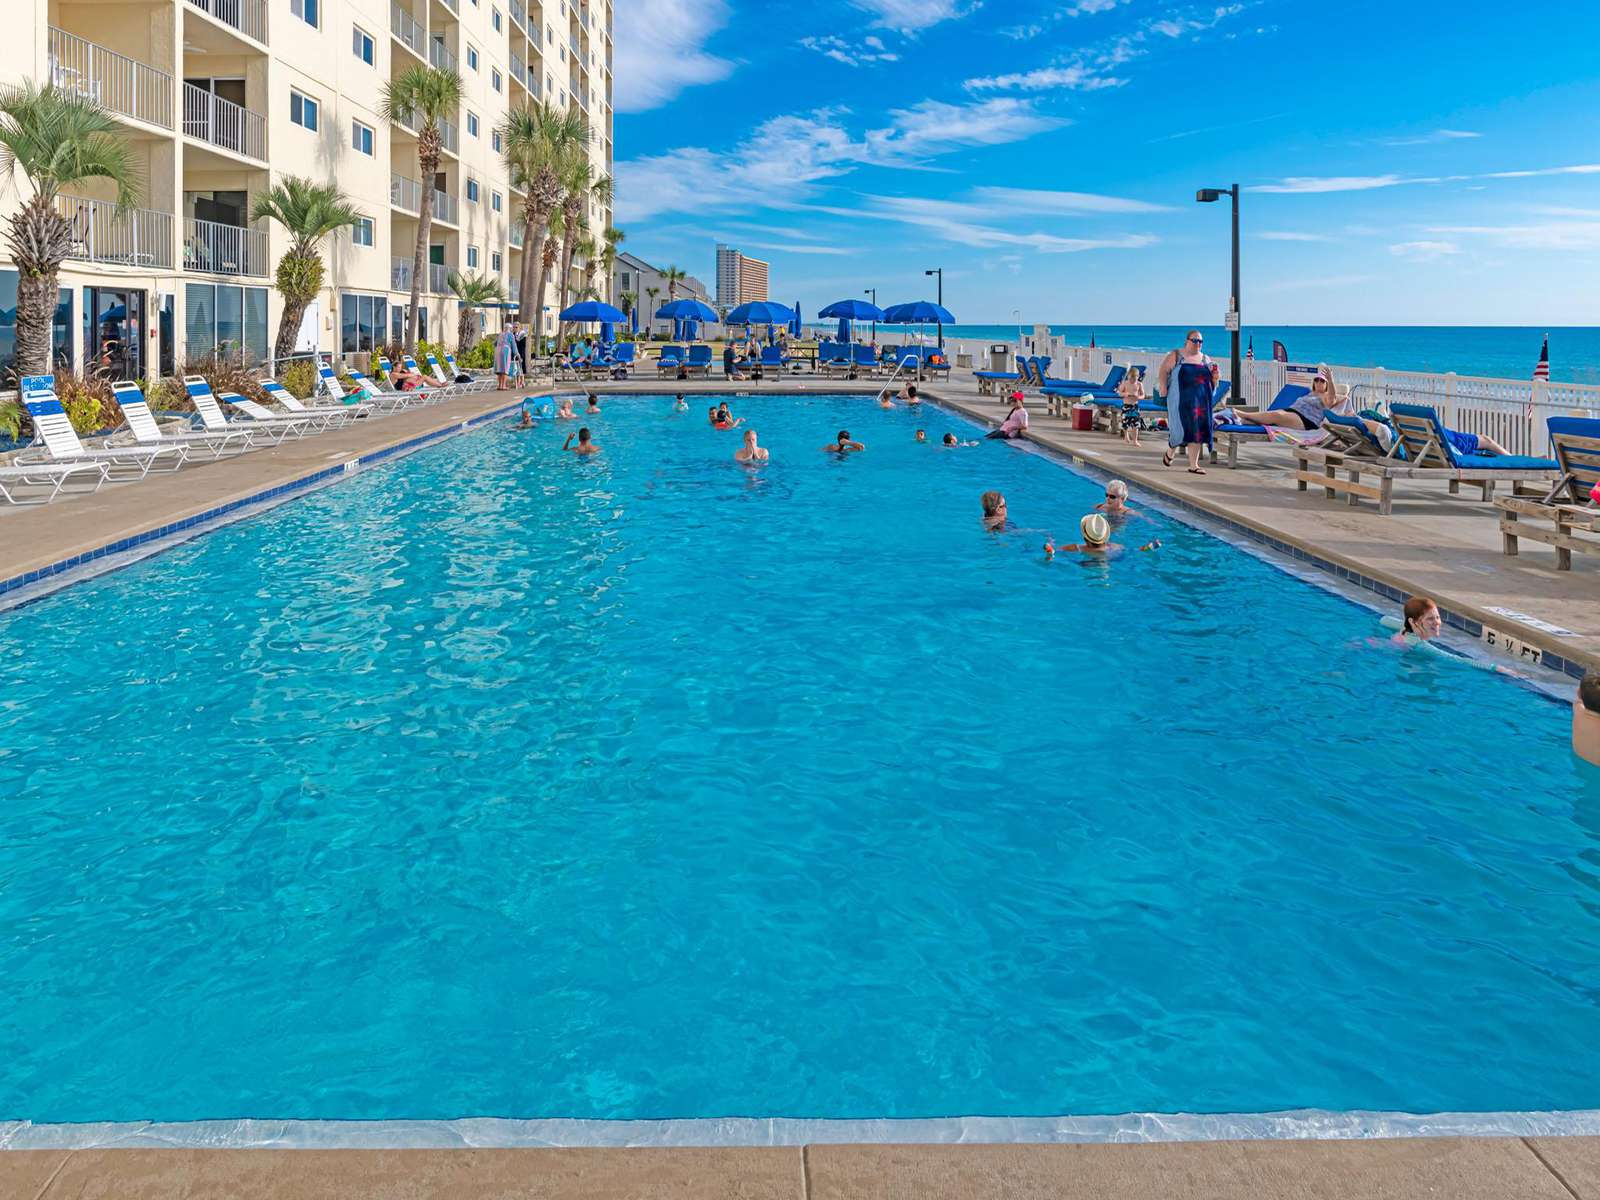 Regency has great swimming amenities!